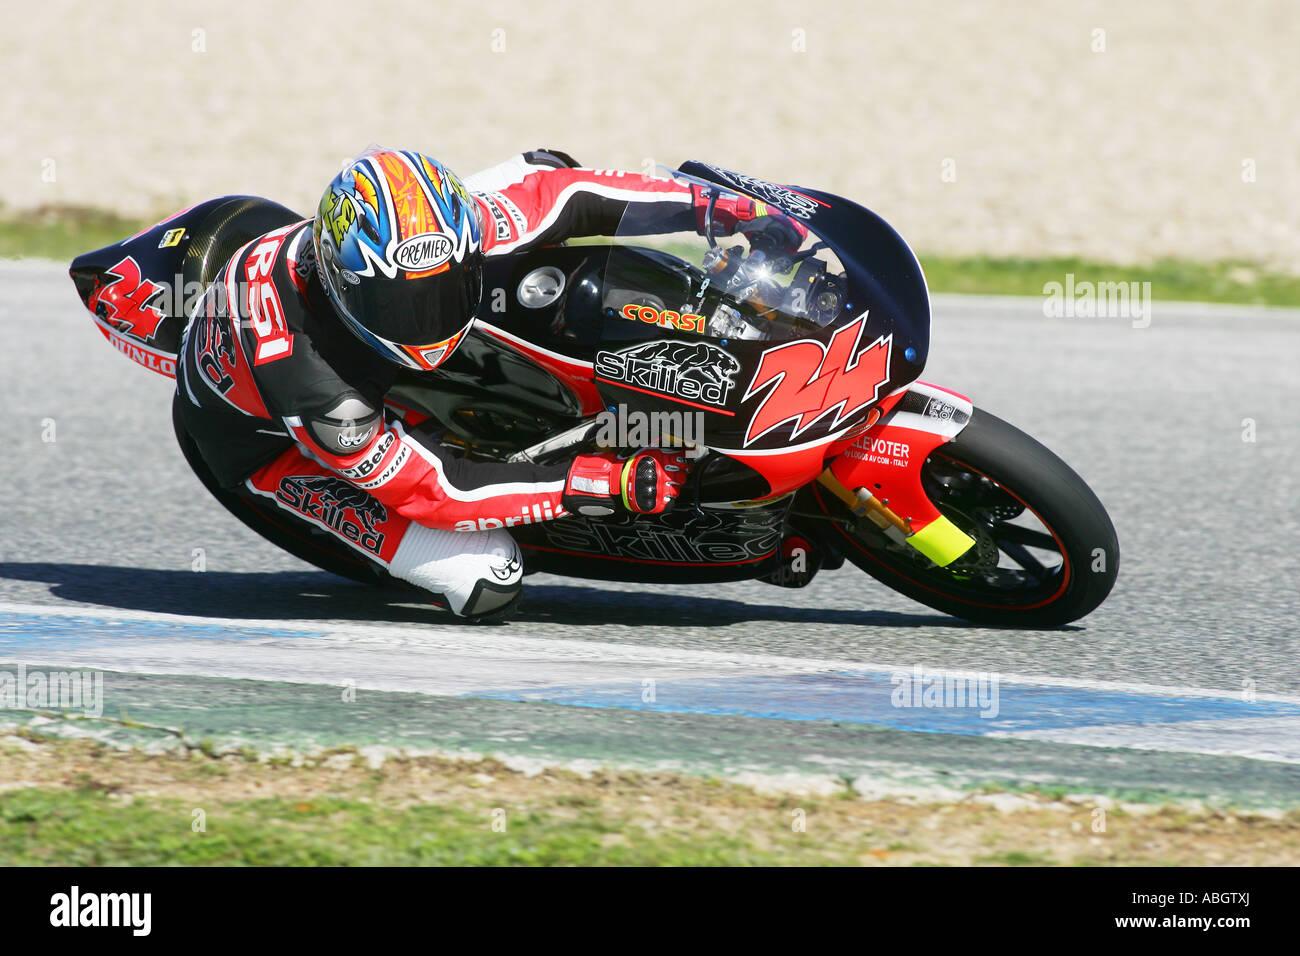 125 gp moto racing at jerez - Stock Image